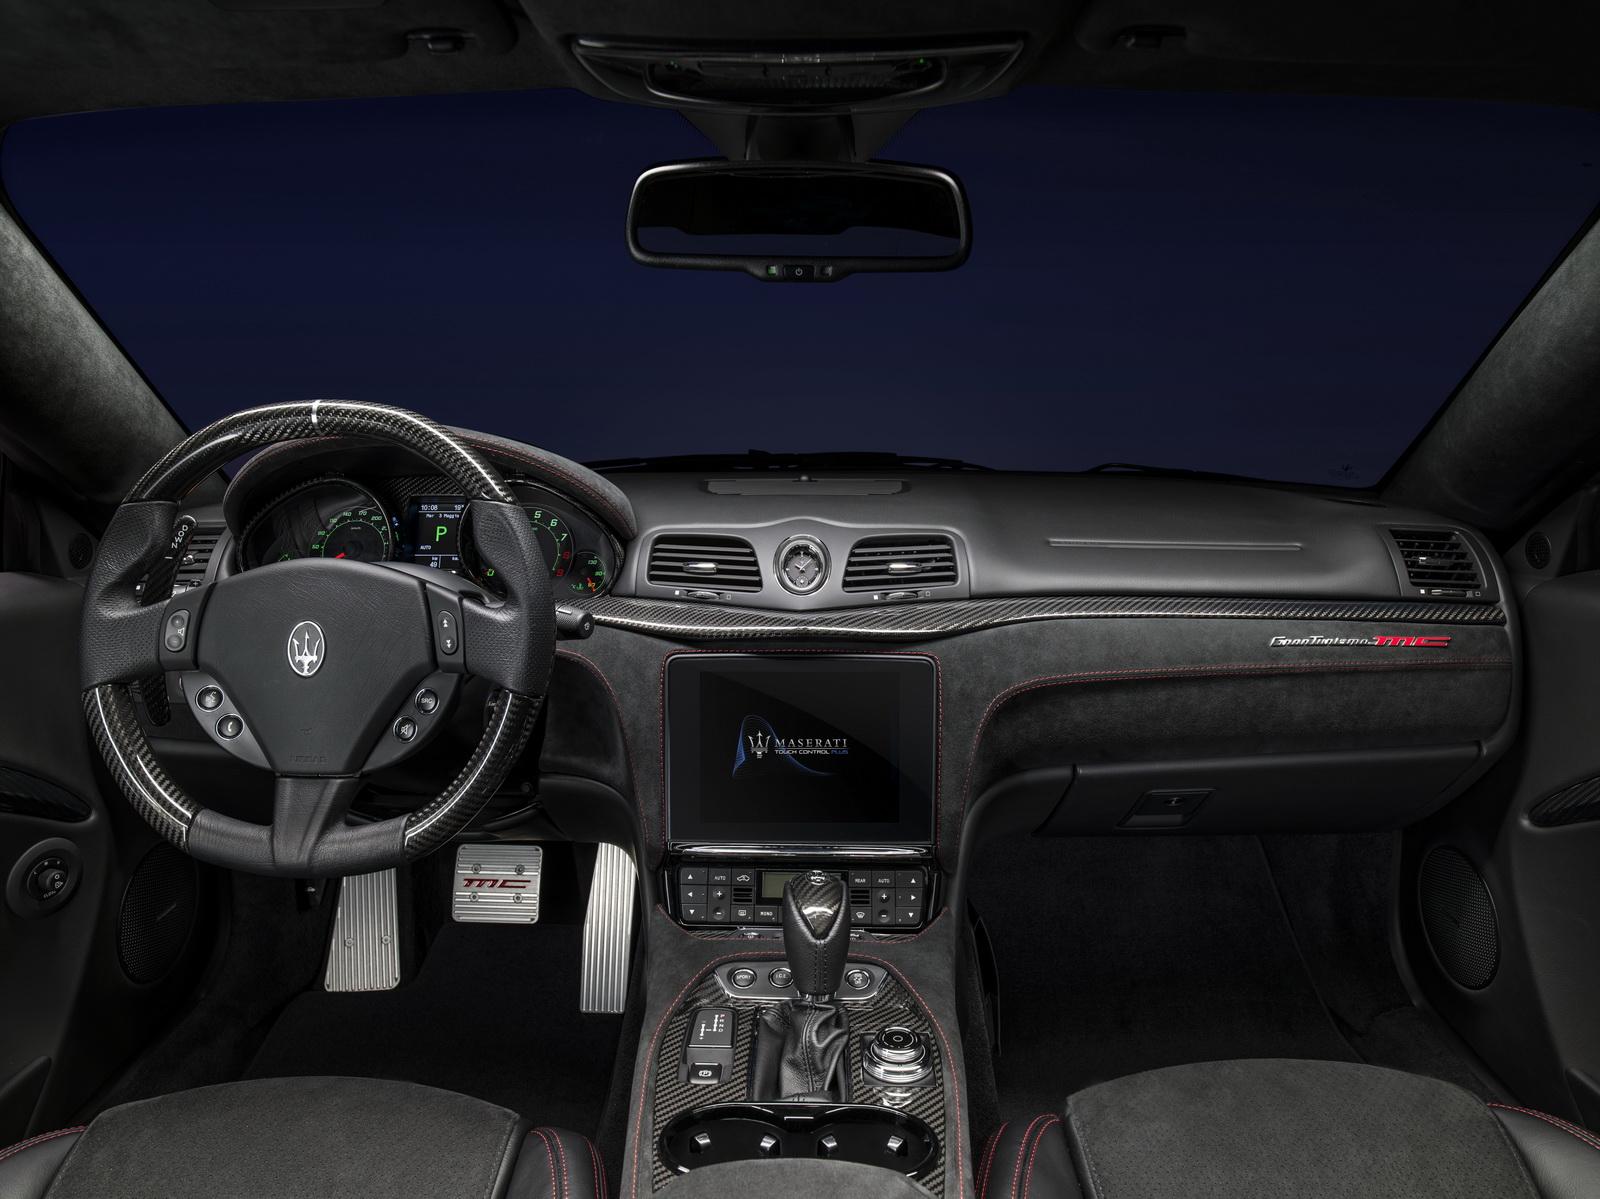 2018 maserati cabrio. wonderful cabrio the granturismo guarantees precise guidance of wheeltravel and its  strengthened antiroll bars suppress unwanted bodymovement for 2018 maserati cabrio